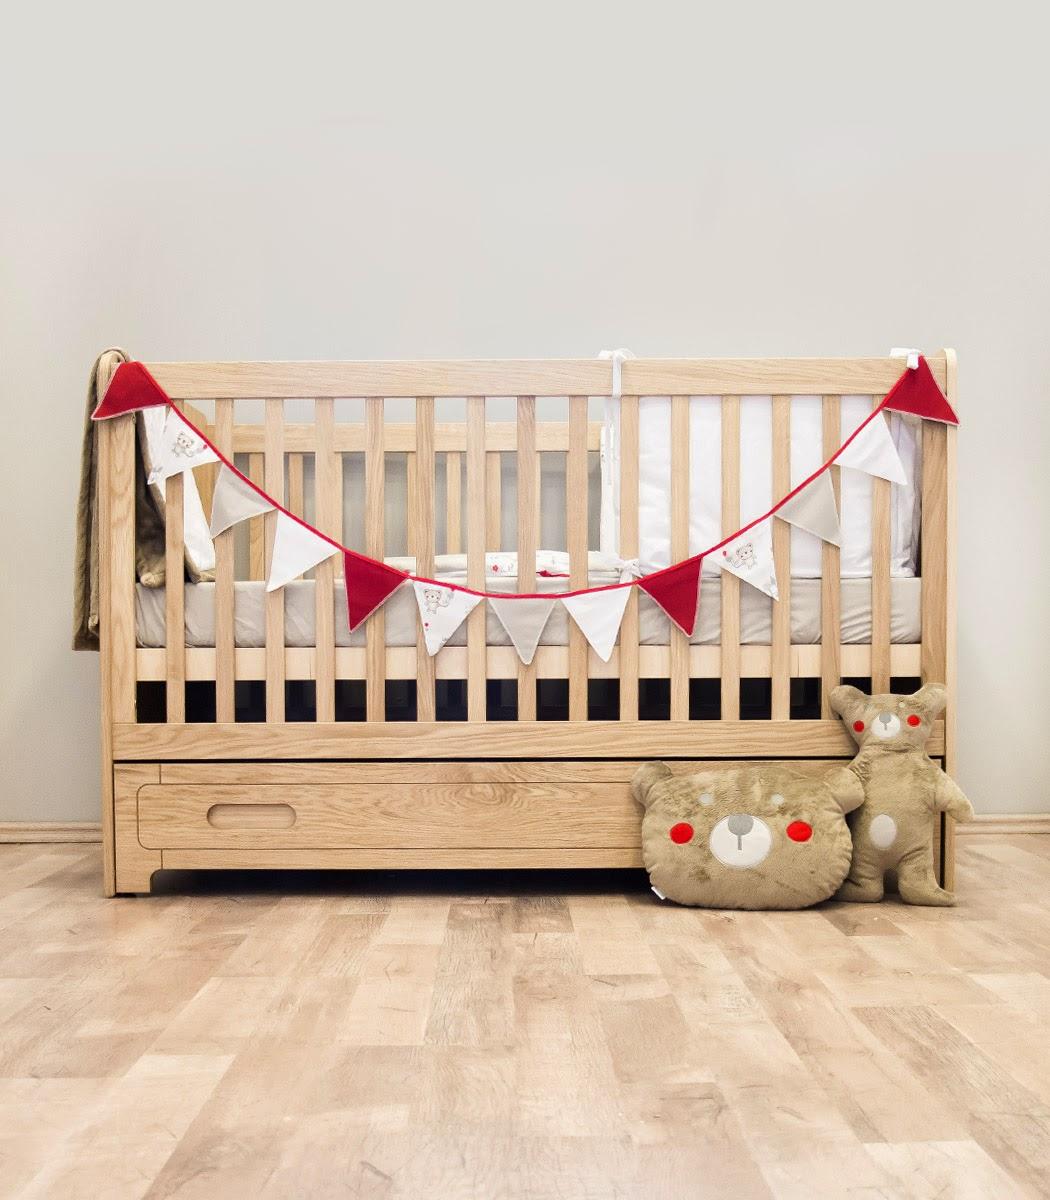 http://allegro.pl/dekoracyjna-girlanda-2m-design-do-pokoju-dziecka-i5046214446.html